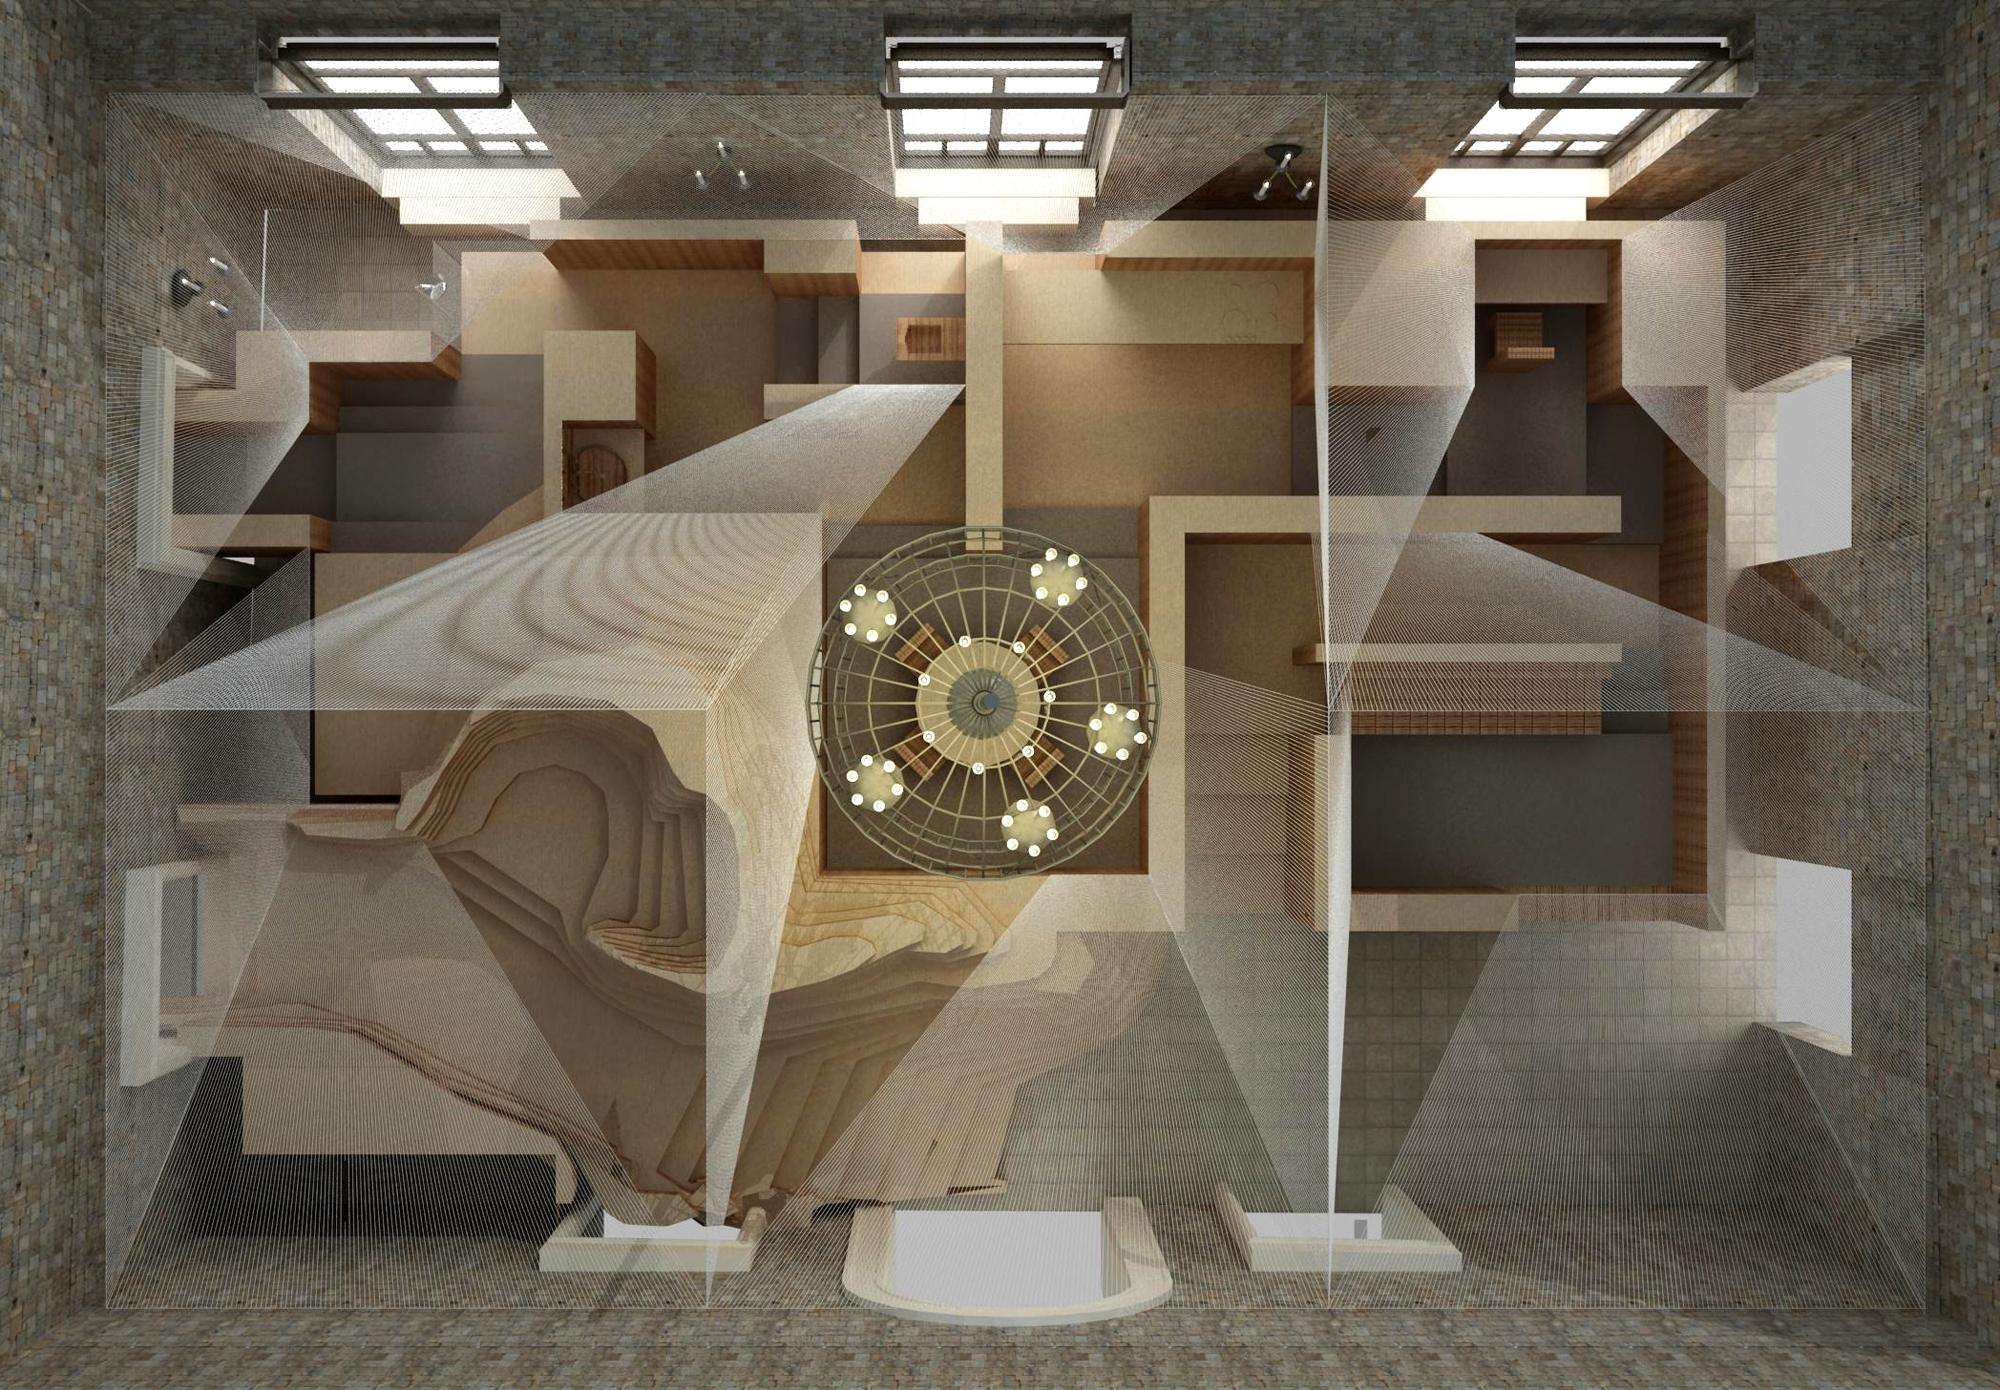 Bienal de Veneza  2012: Pavilhão de Taiwan, Cortesia do Museu Nacional de Taiwan de Belas Artes